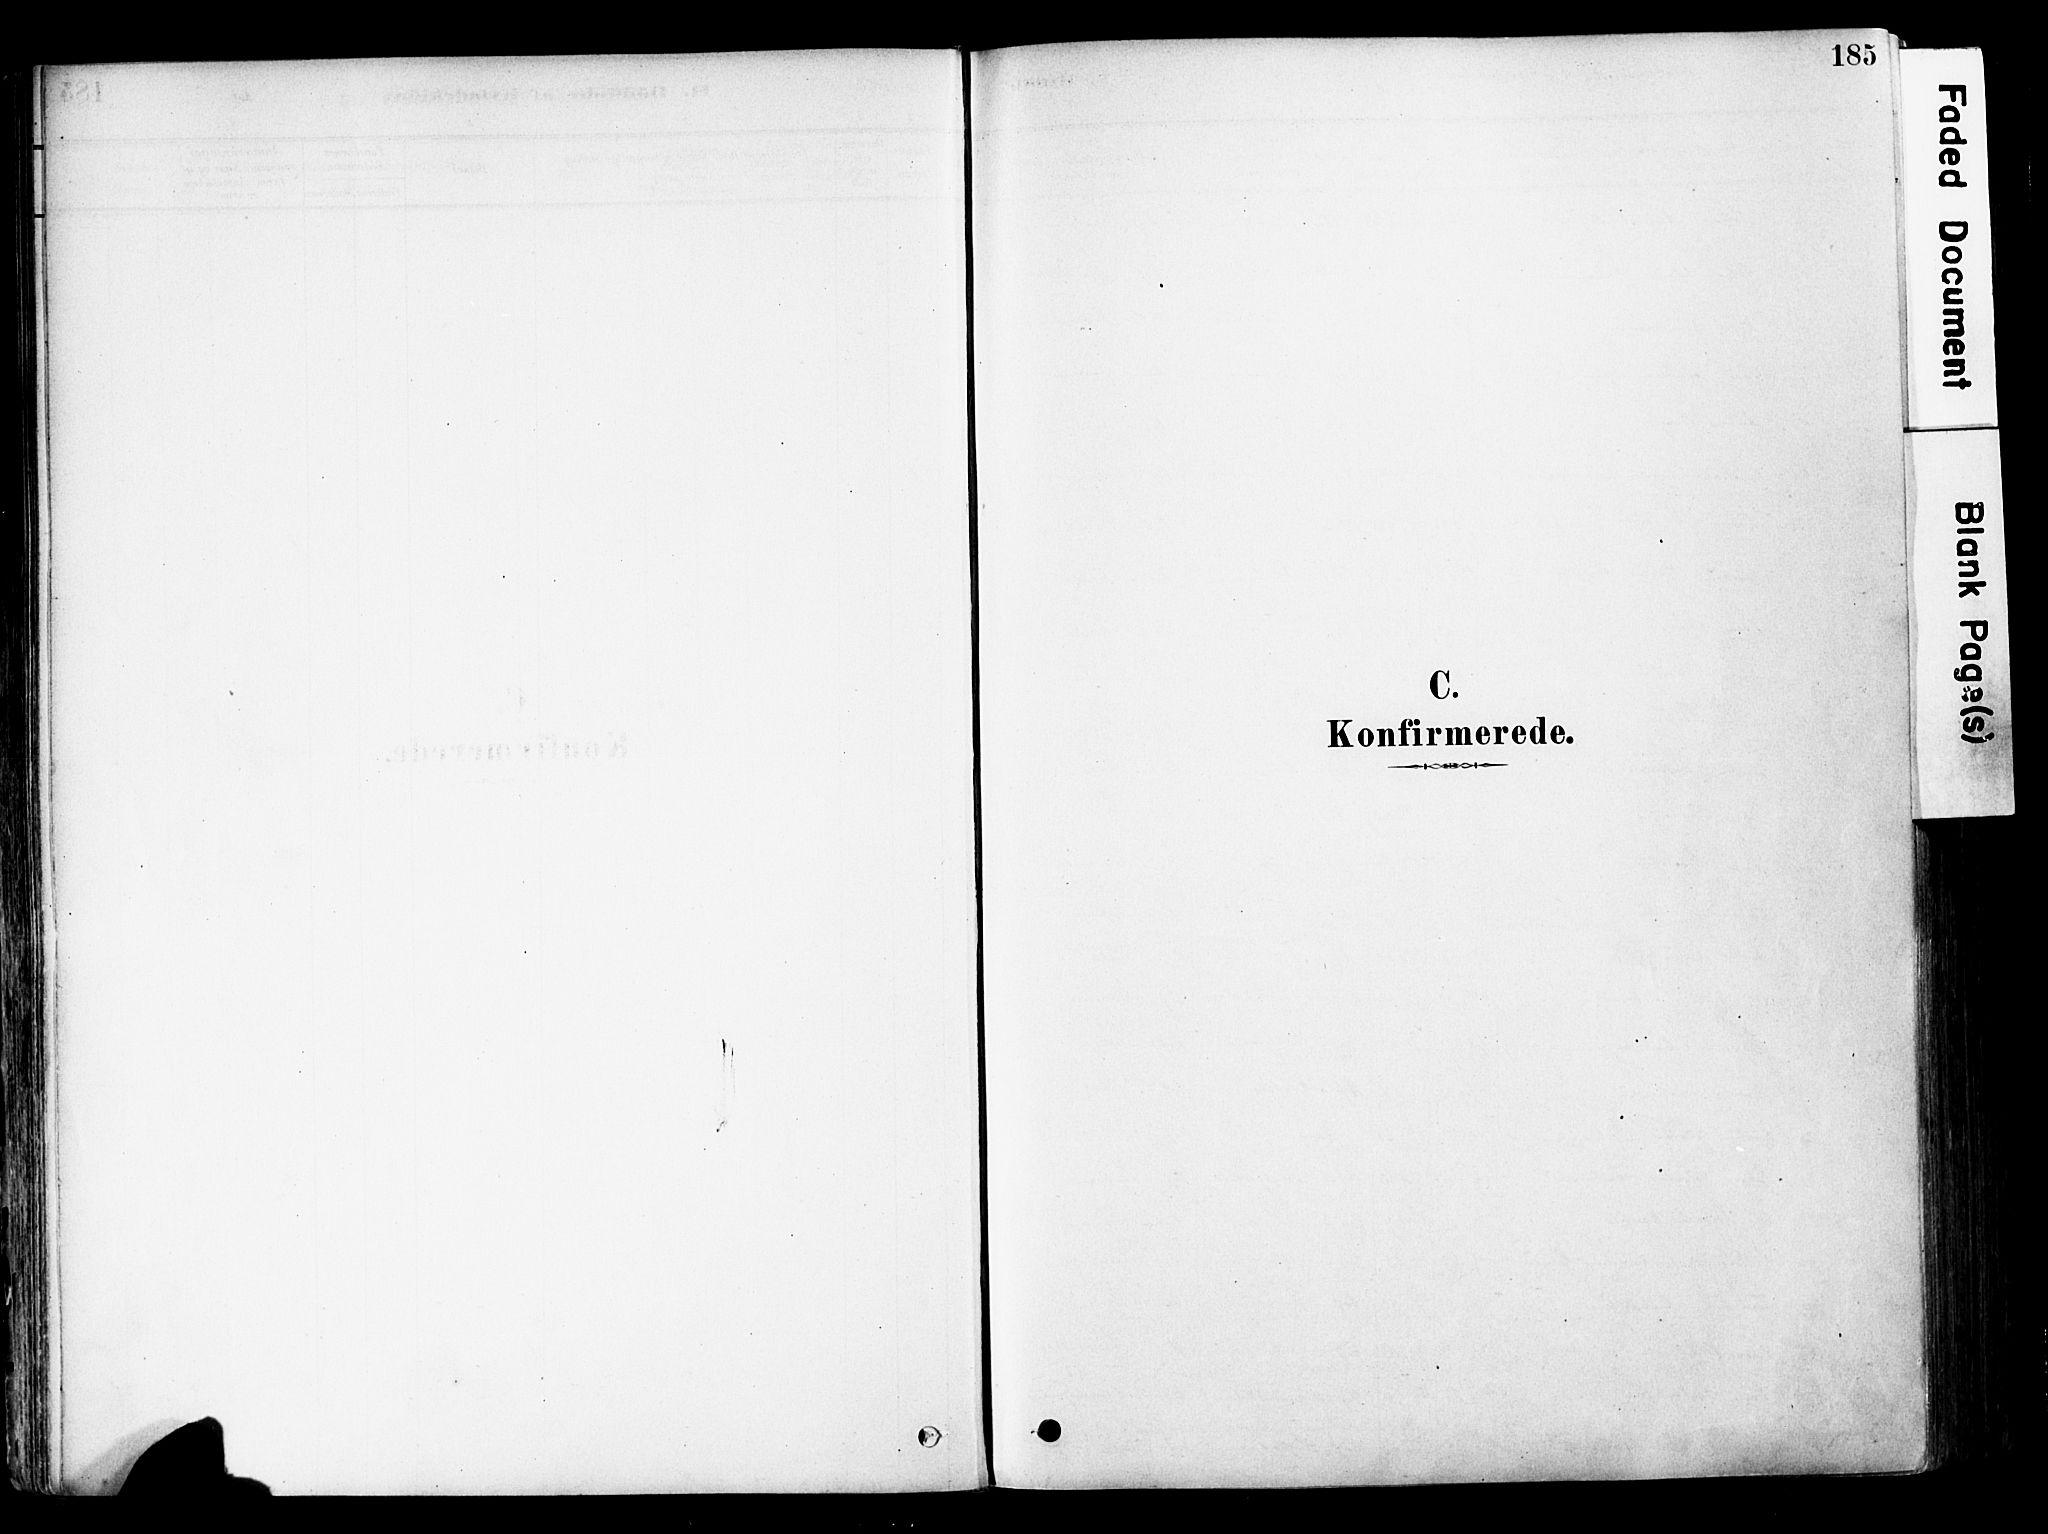 SAH, Østre Toten prestekontor, Ministerialbok nr. 6 /1, 1878-1896, s. 185